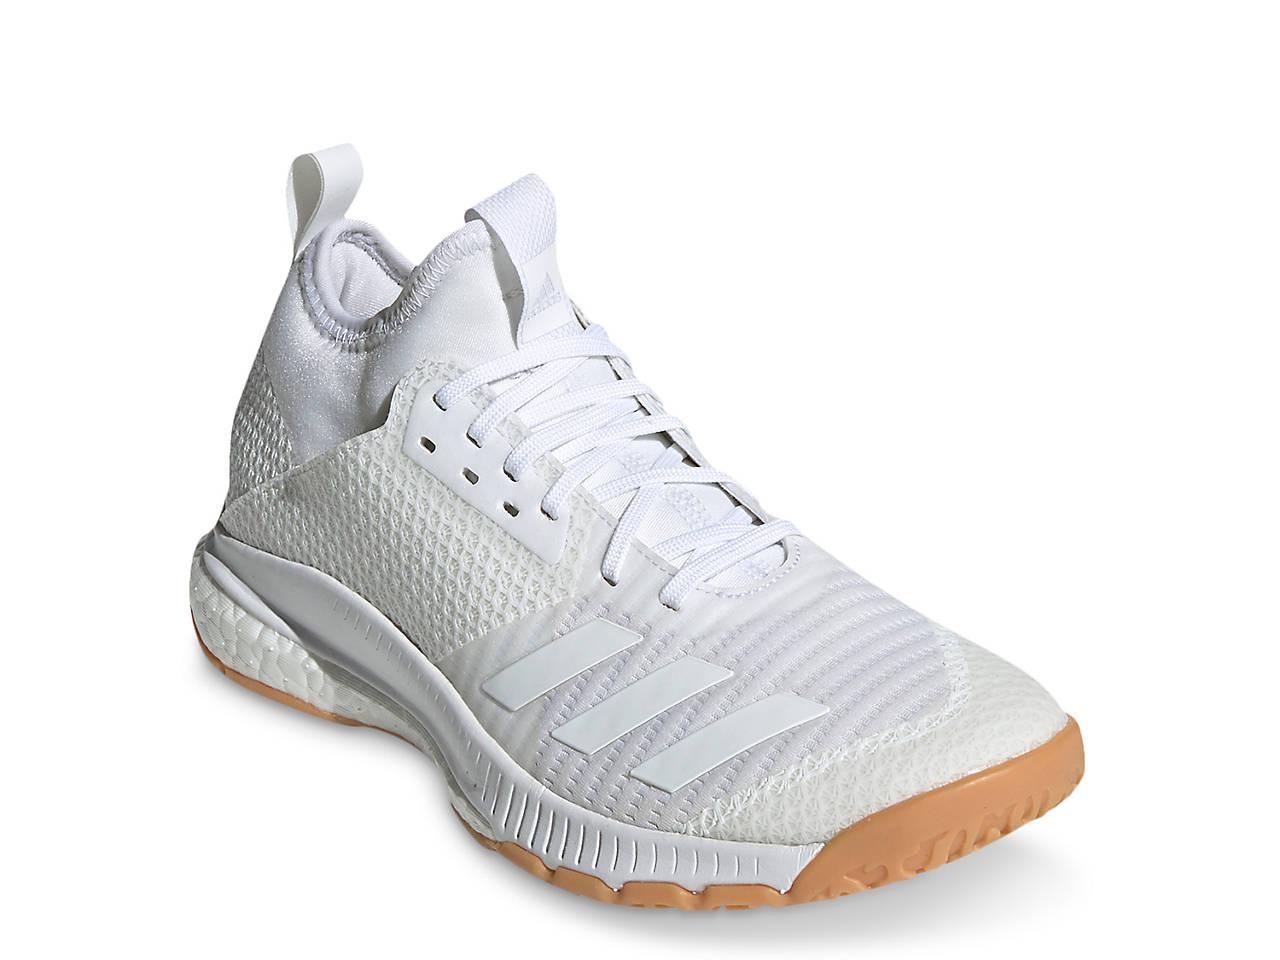 adidas Crazyflight X 3 Volleyball Mid Top Training Shoe